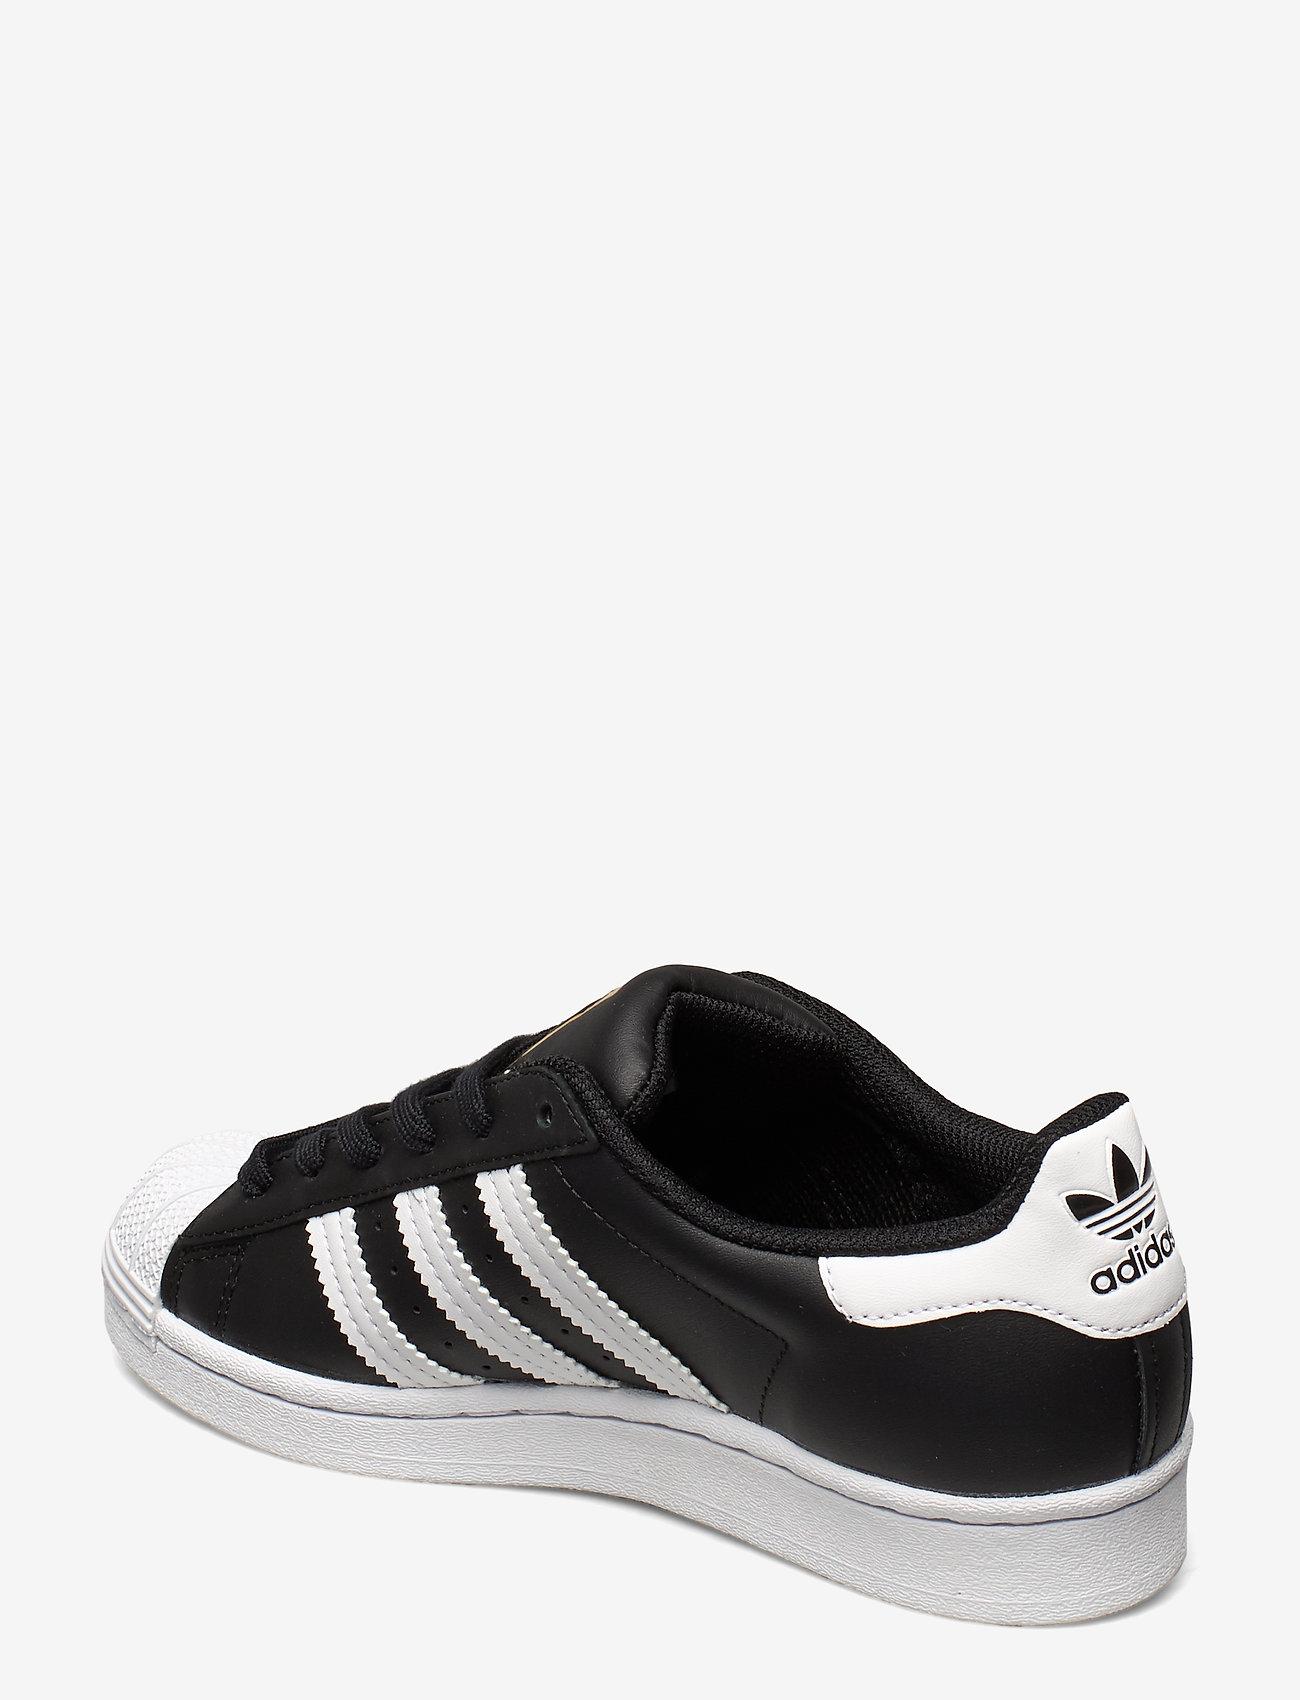 adidas Originals - Superstar  W - low top sneakers - cblack/ftwwht/cblack - 2